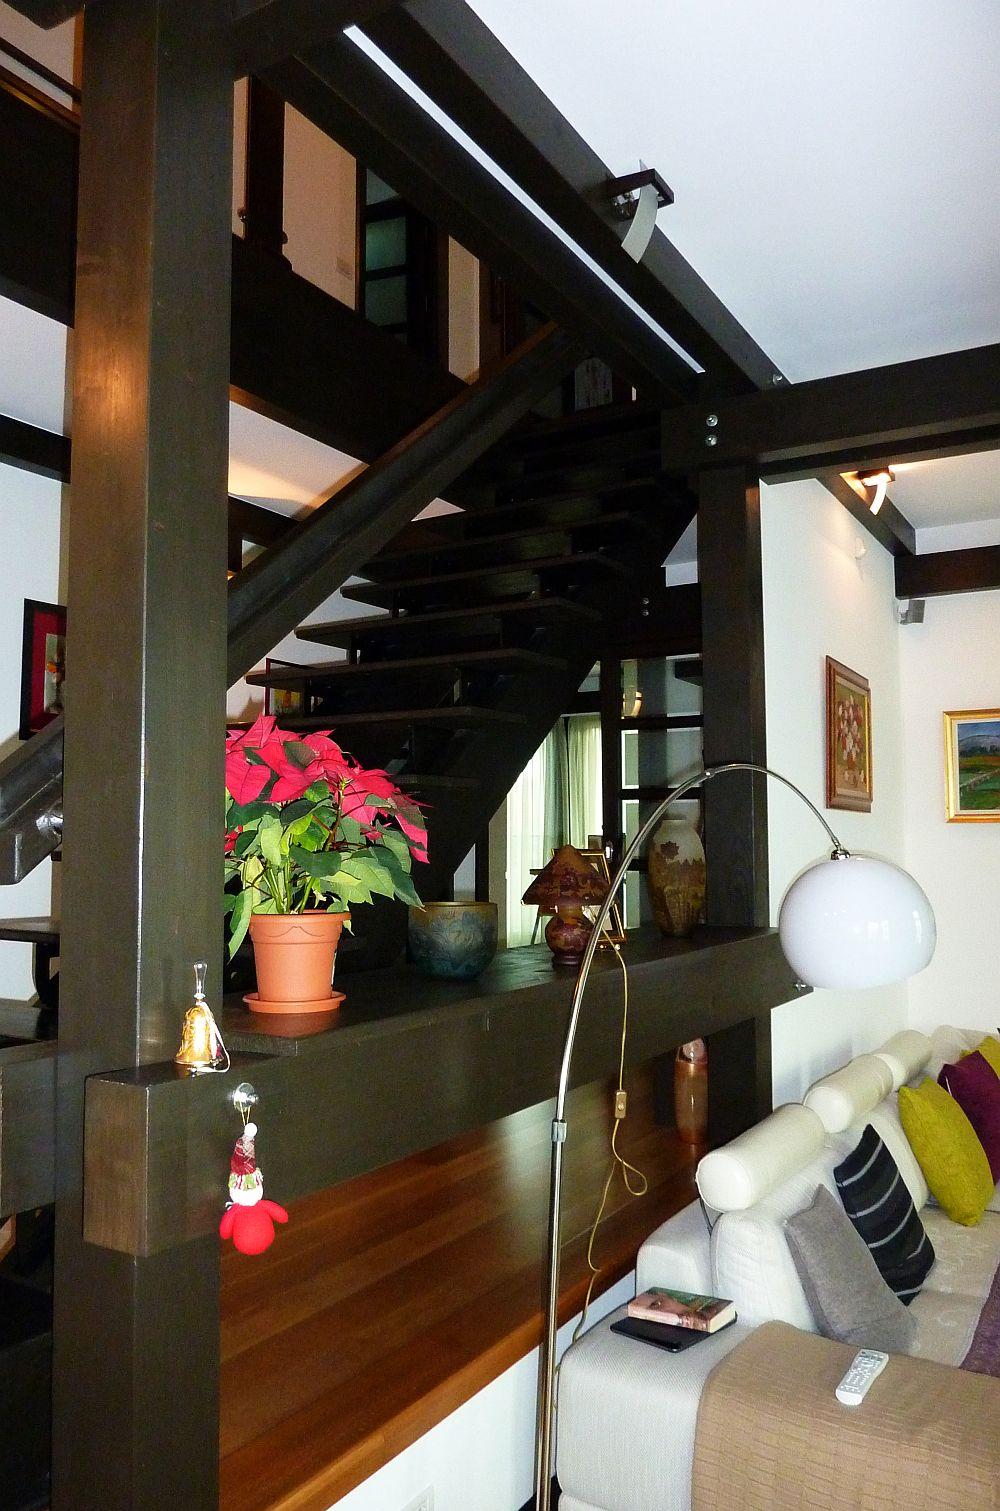 adelaparvu.com despre casa modulara pe sistem de barne, arhitectura Soleta (21)